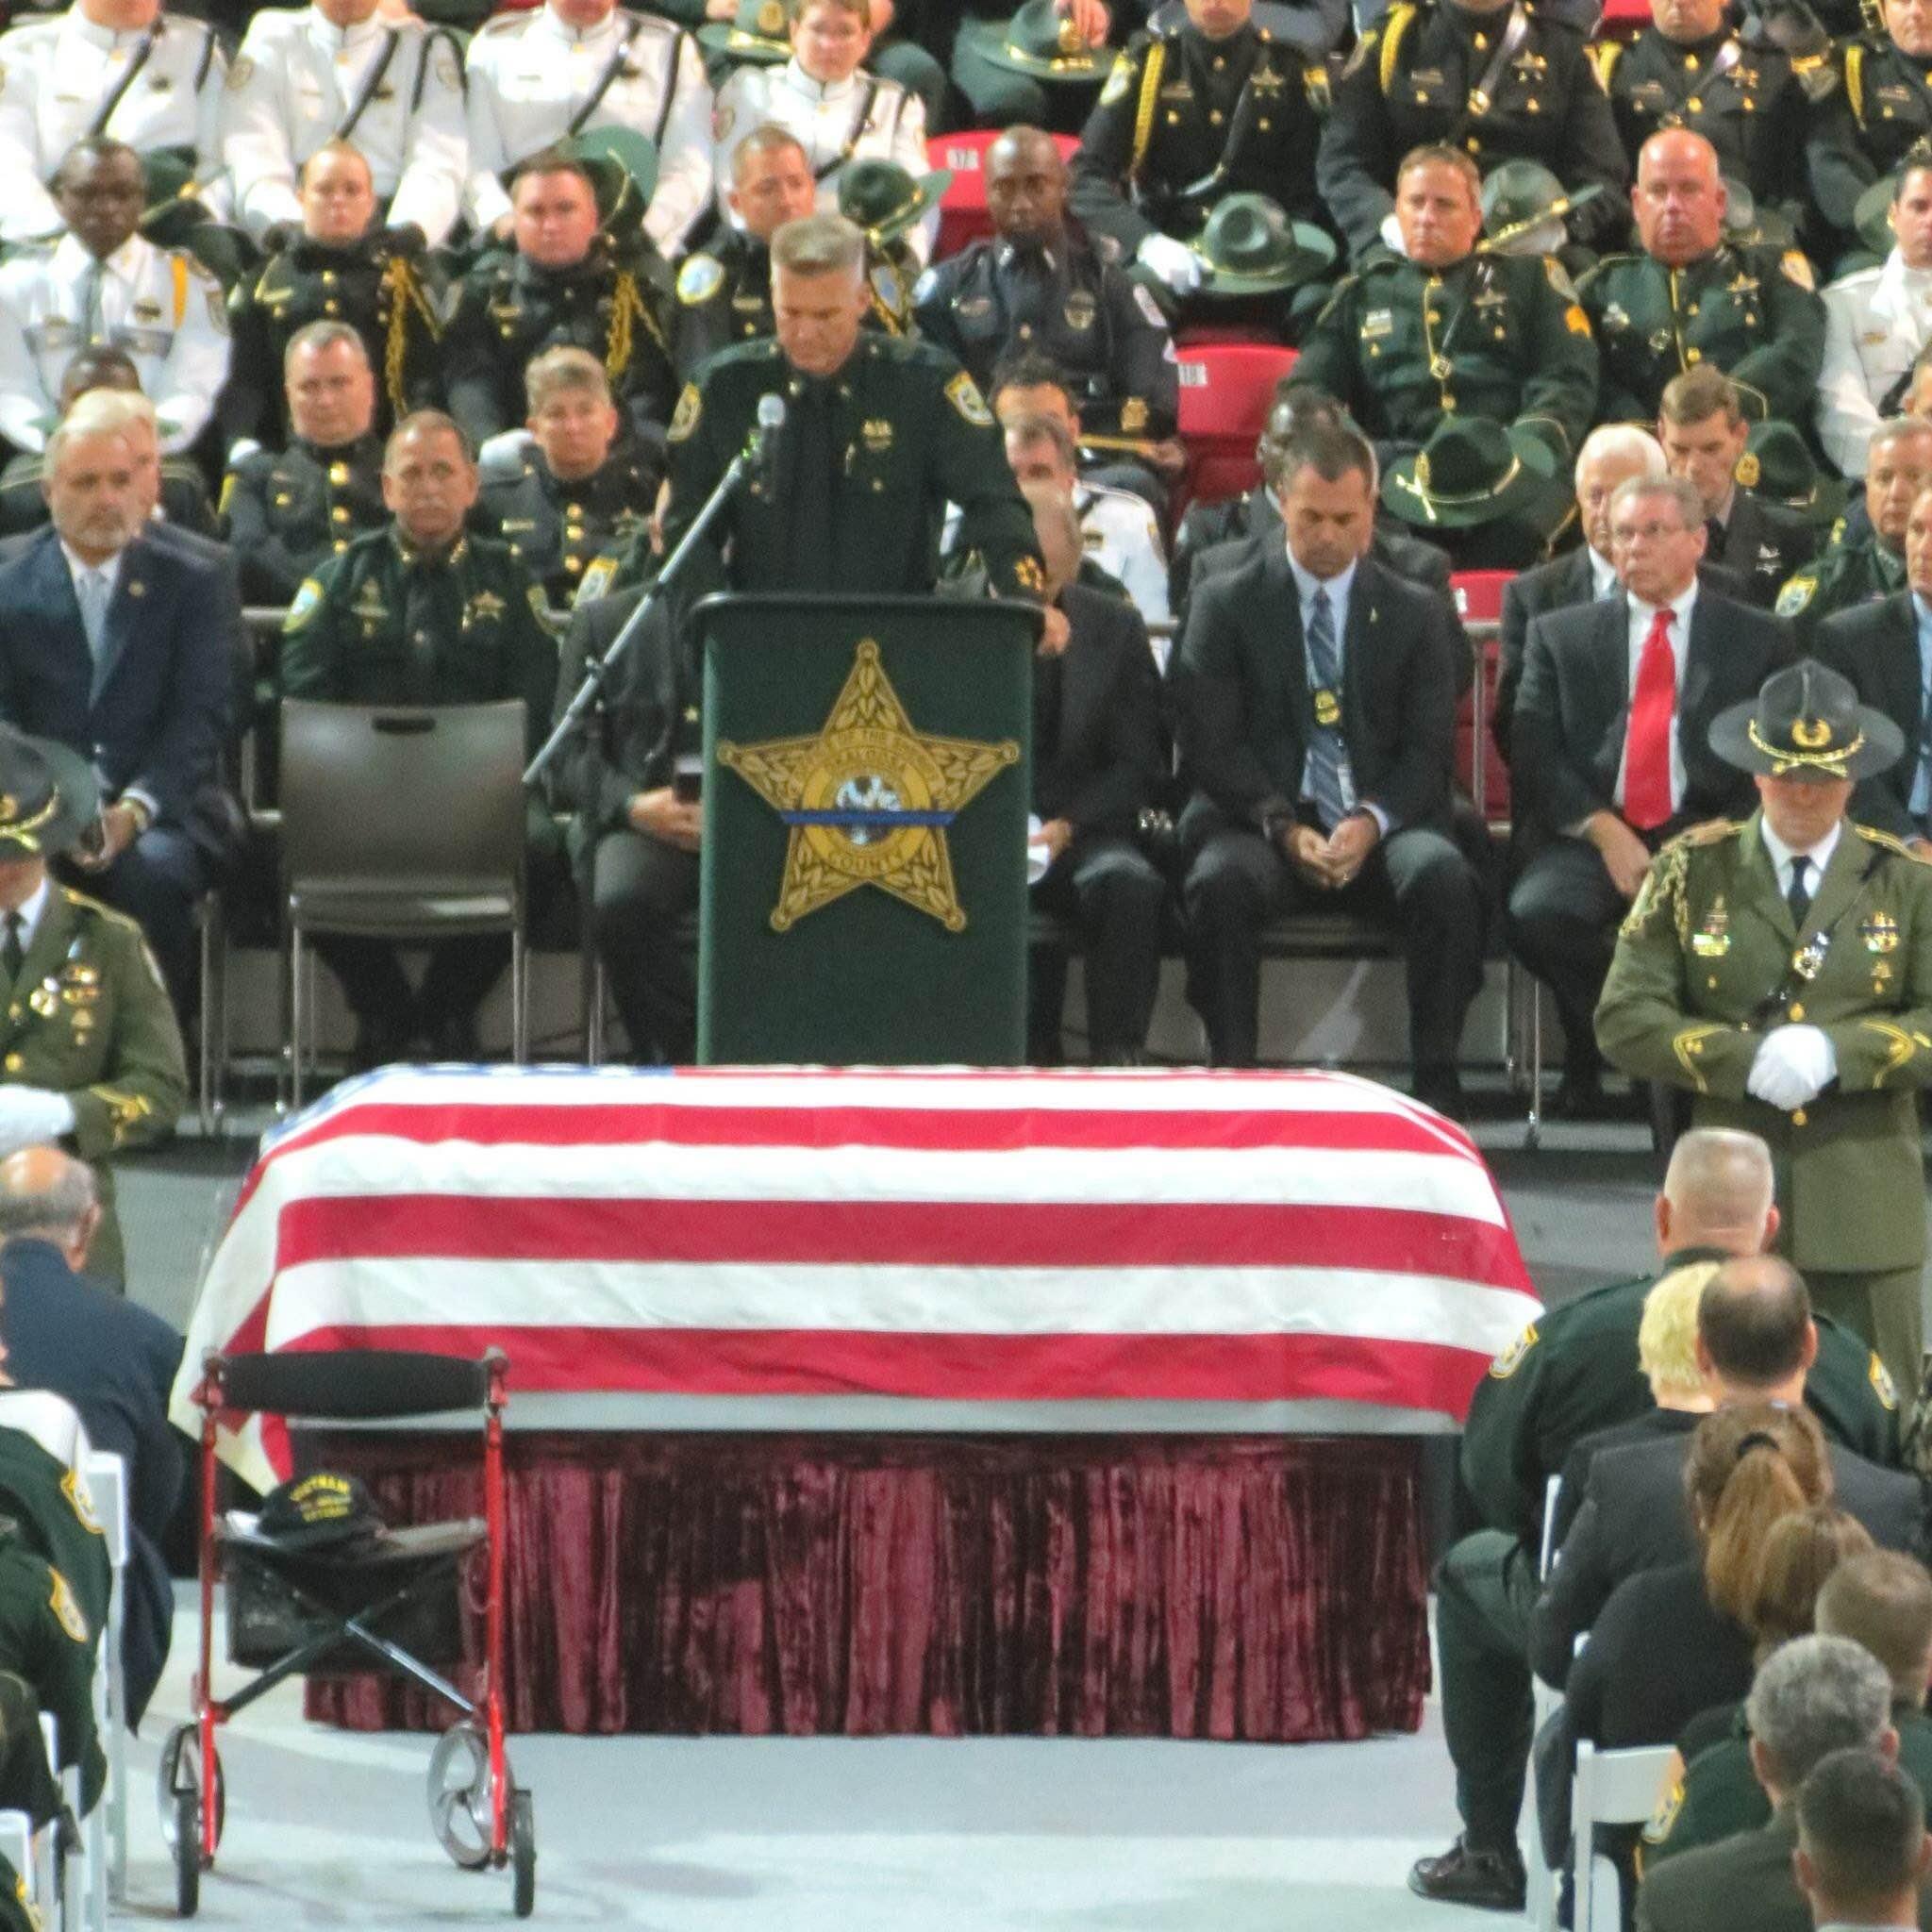 okaloosa deputy bill myers remembered in solemn ceremony